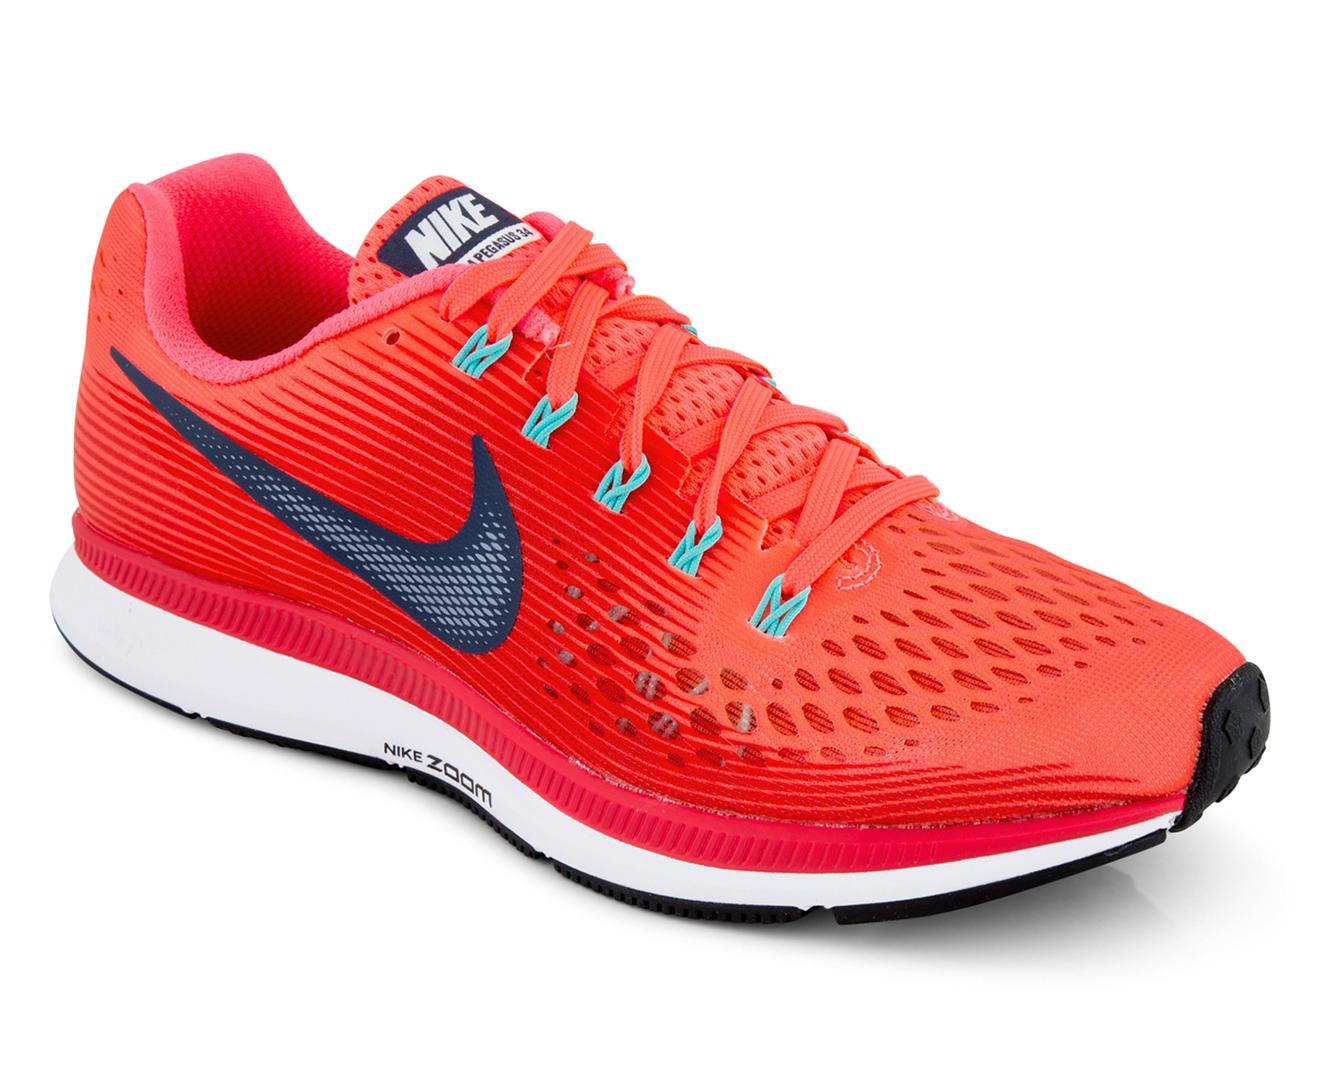 best loved 76c18 53596 Nike Women s Air Zoom Pegasus 34 Shoe - Hot Punch Thunder Blue    Catch.com.au